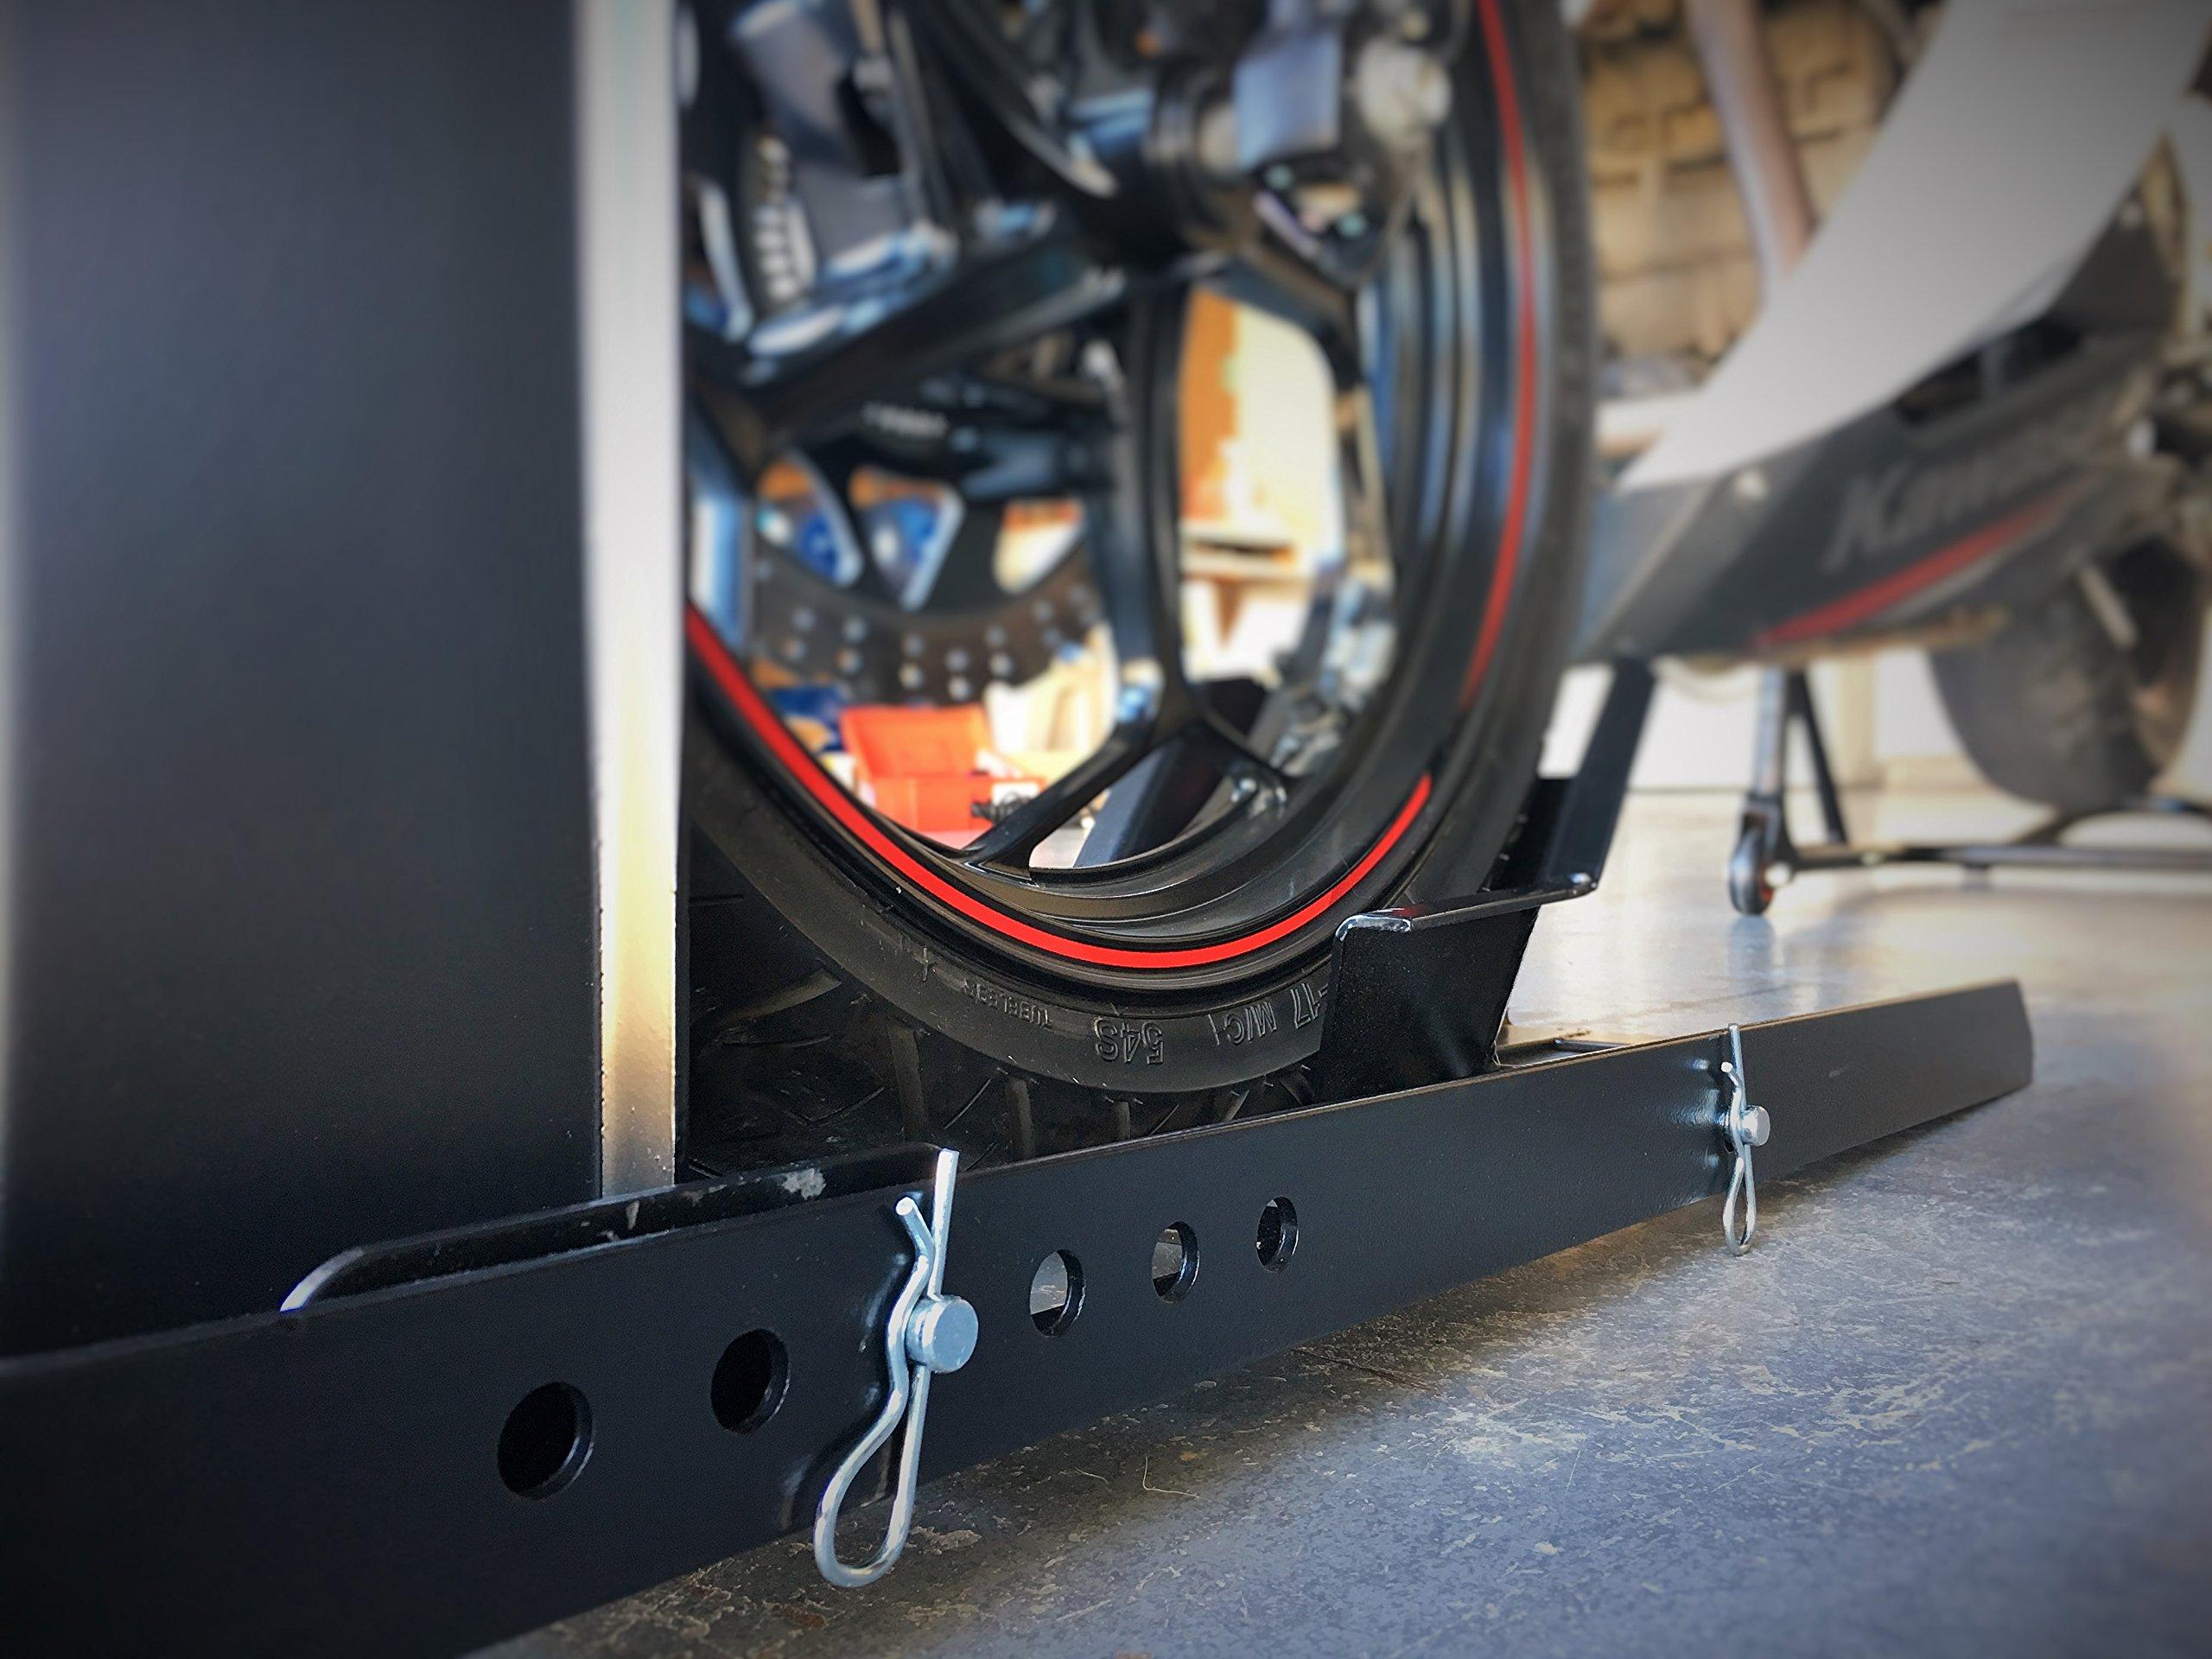 MaxxHaul 70271 Heavy Duty Motorcycle Wheel Chock